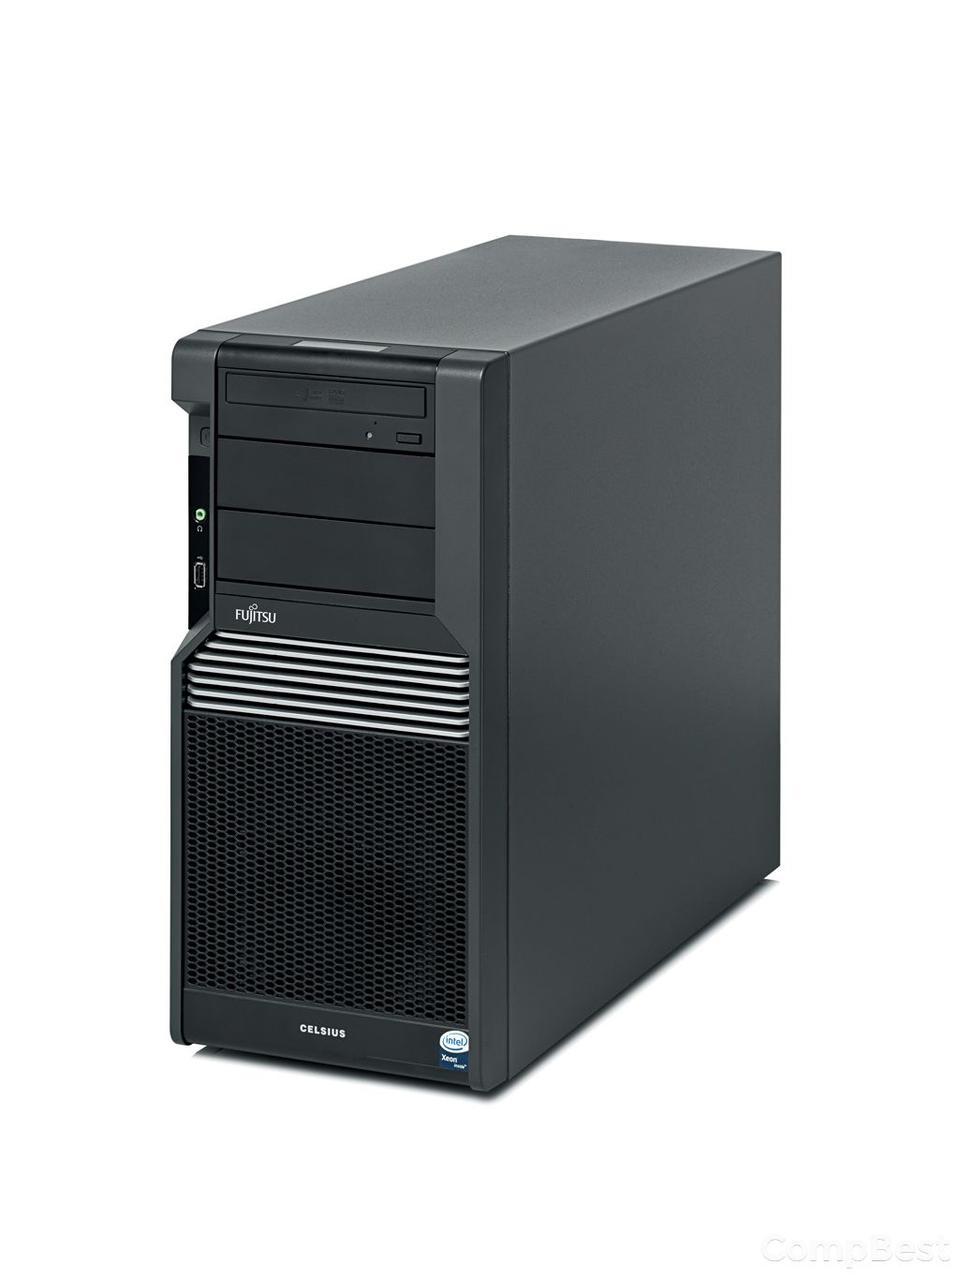 Fujitsu Celsius M470-2 Tower / Intel Xeon W3530 (4(8) ядра по 2.8-3.06GHz) / 12GB DDR3 / 500GB HDD / NVIDIA Quadro FX 1800 768MB 192-bit , DVI